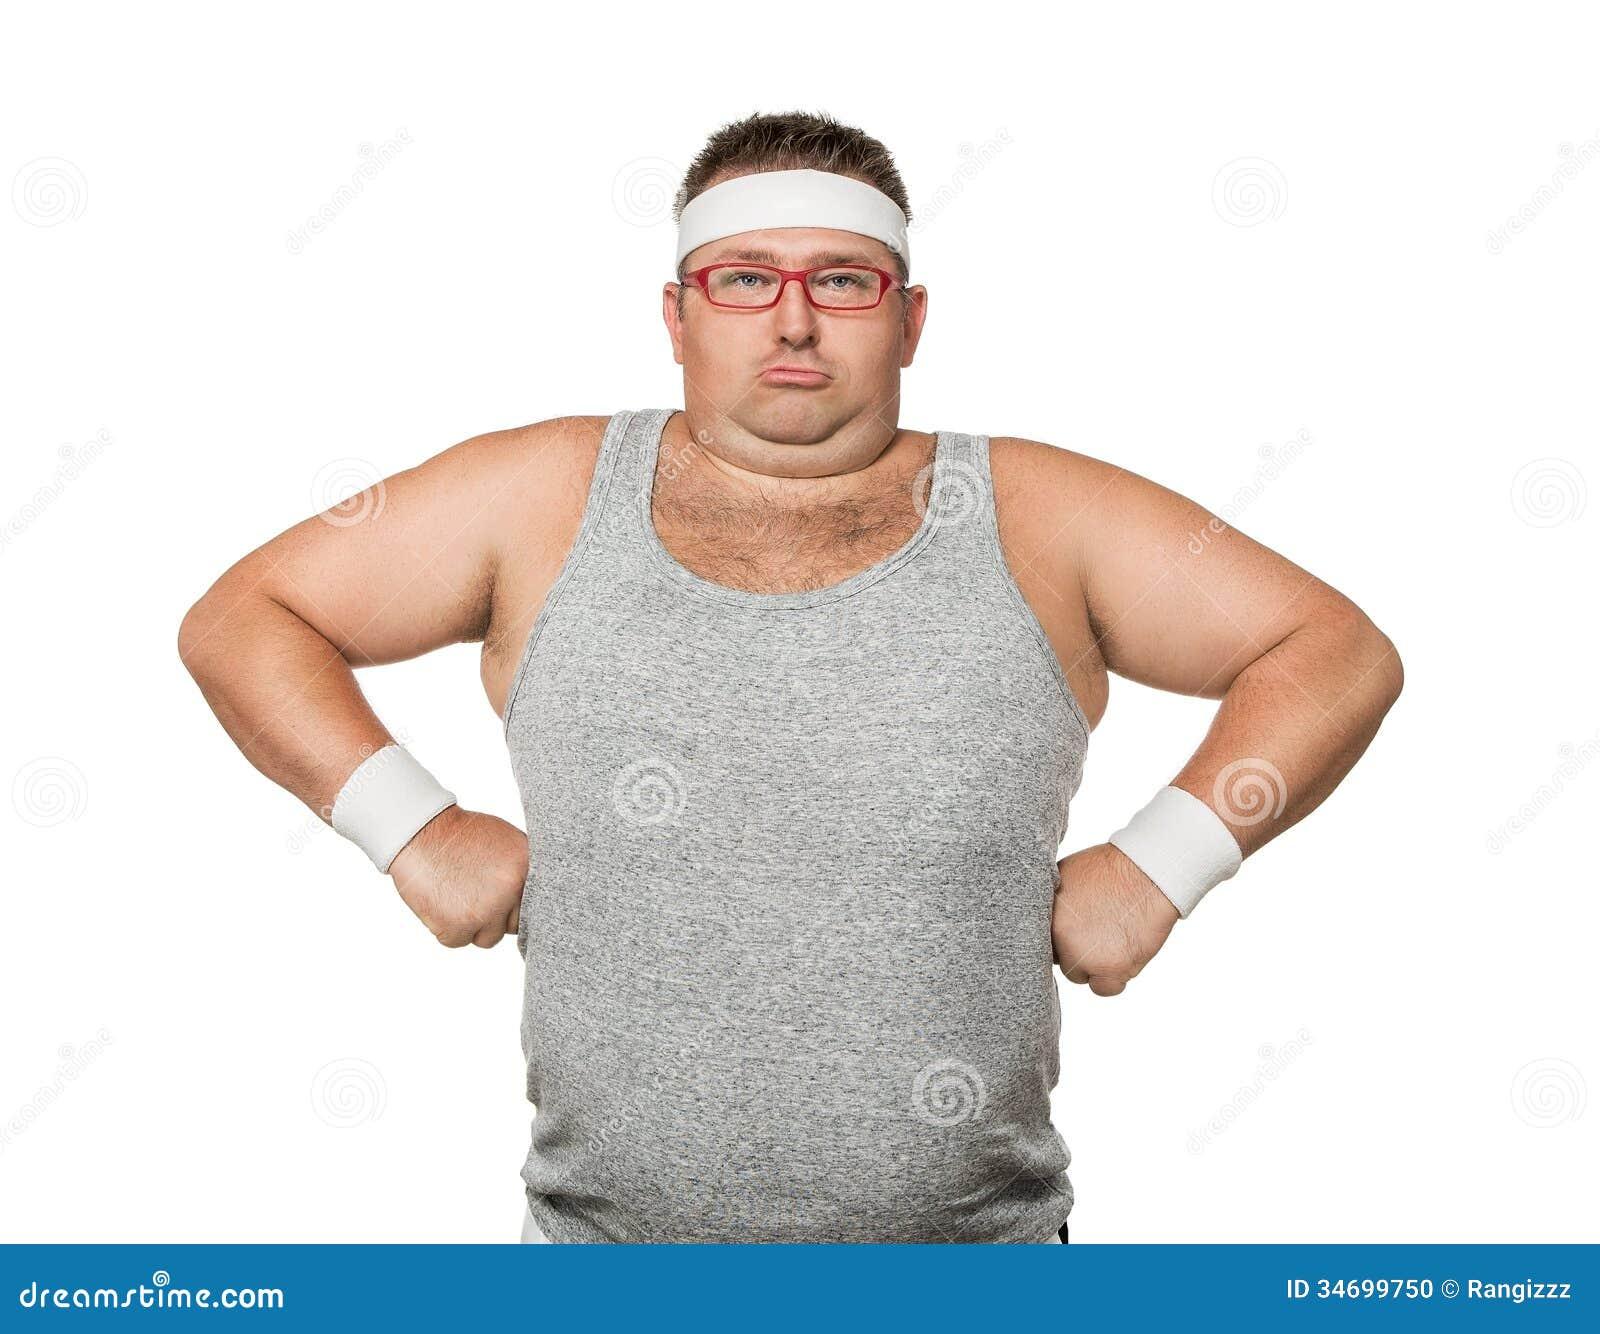 Funny Sports Man Stock Photo - Image: 34699750